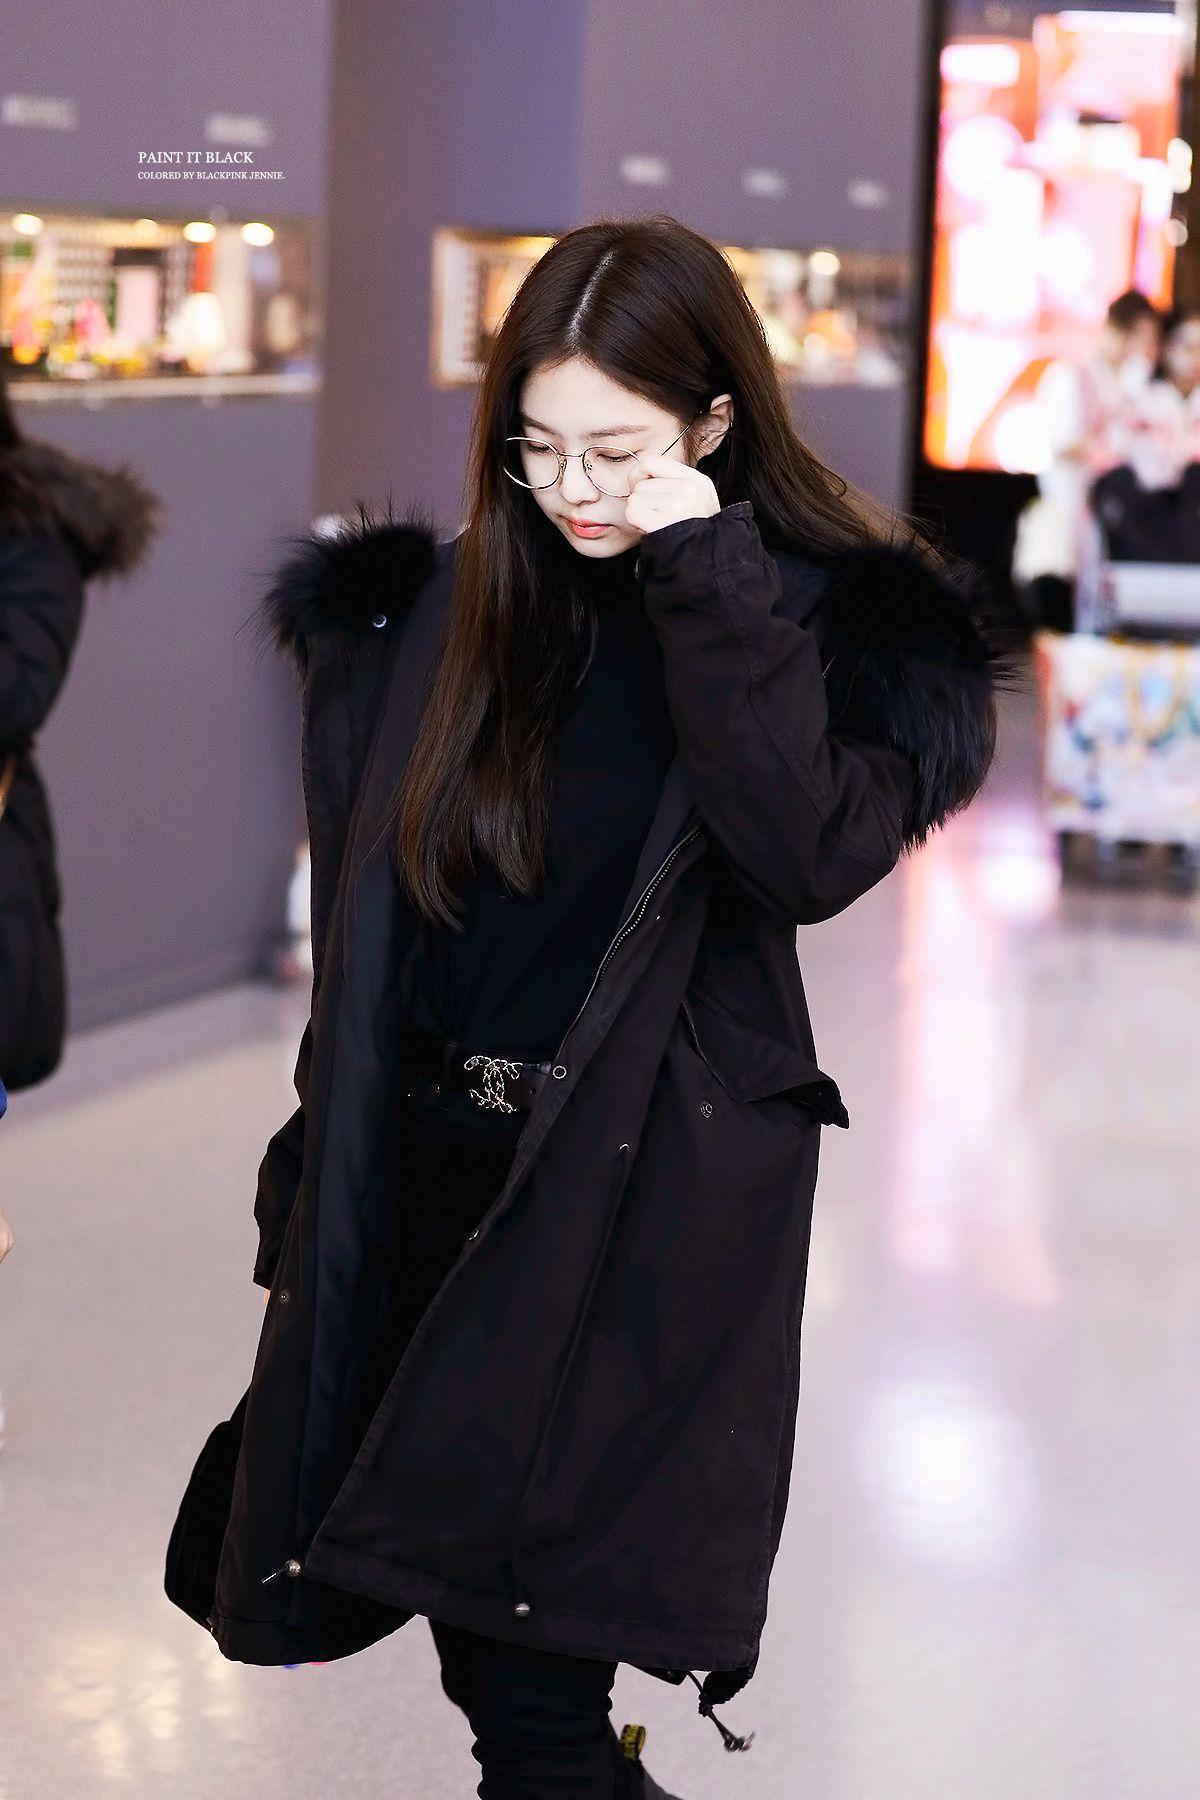 Jennie Airport Jennie Kimjennie Blackpink Model Pakaian